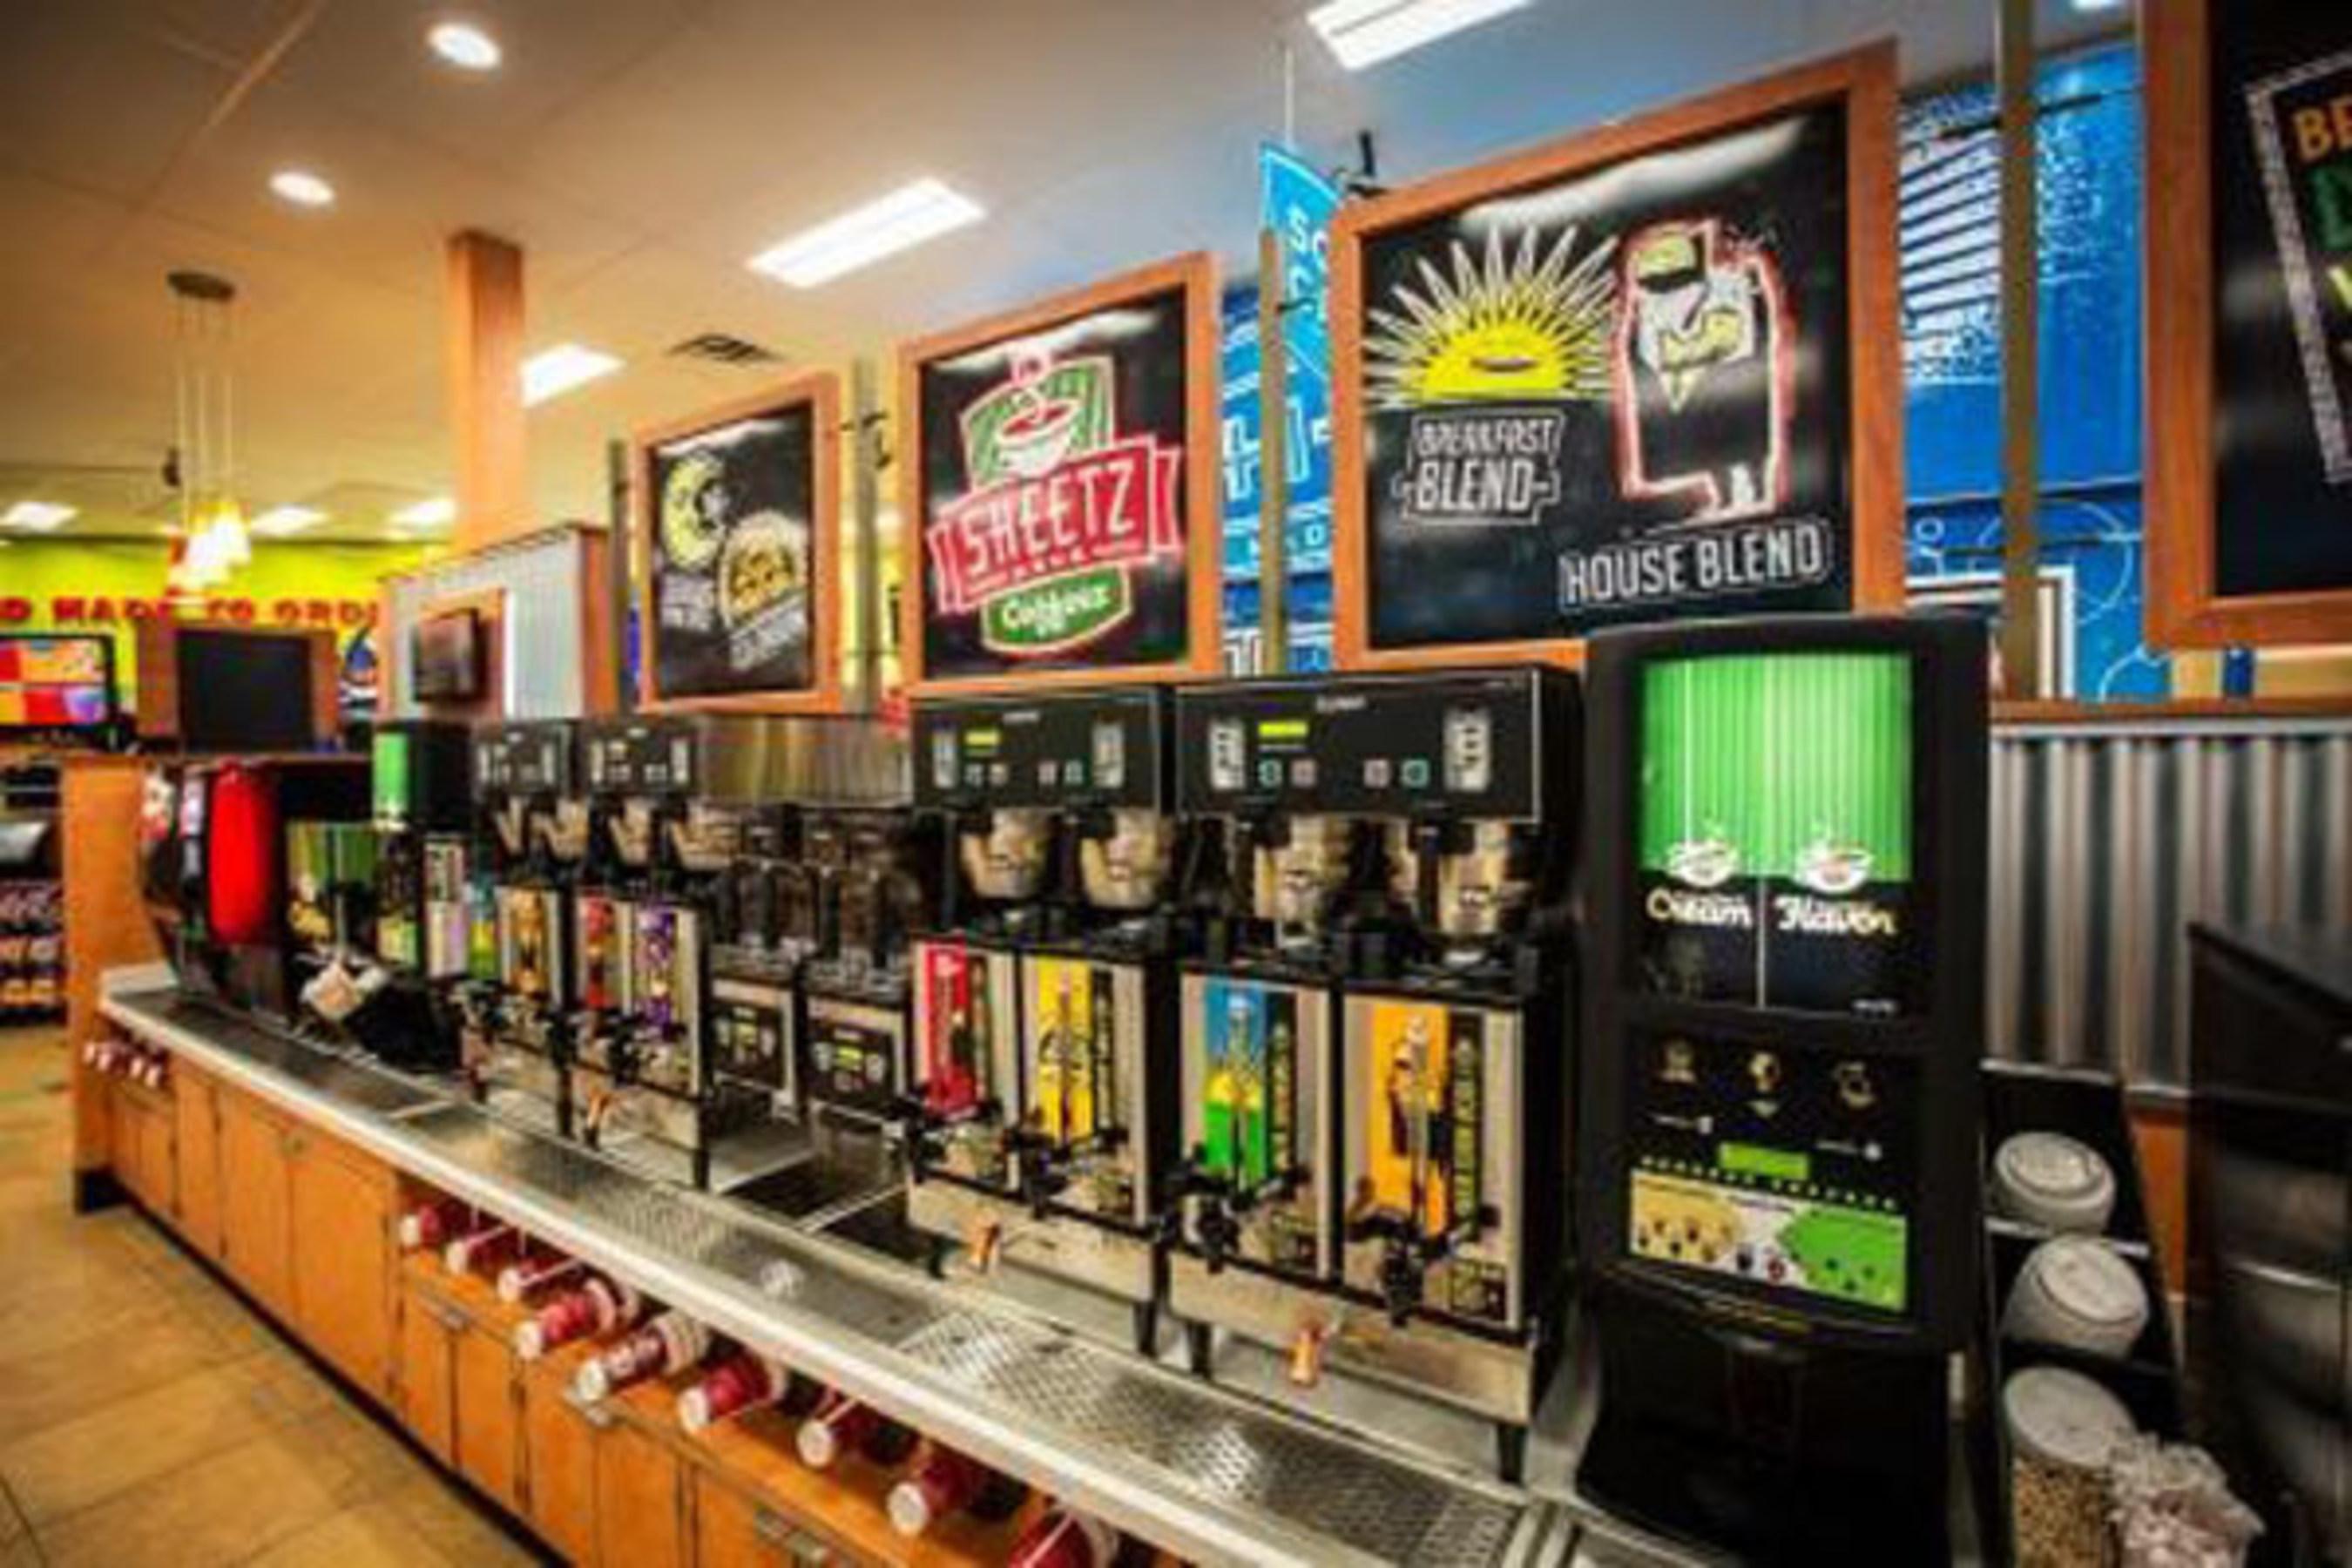 Sheetz Free Coffee